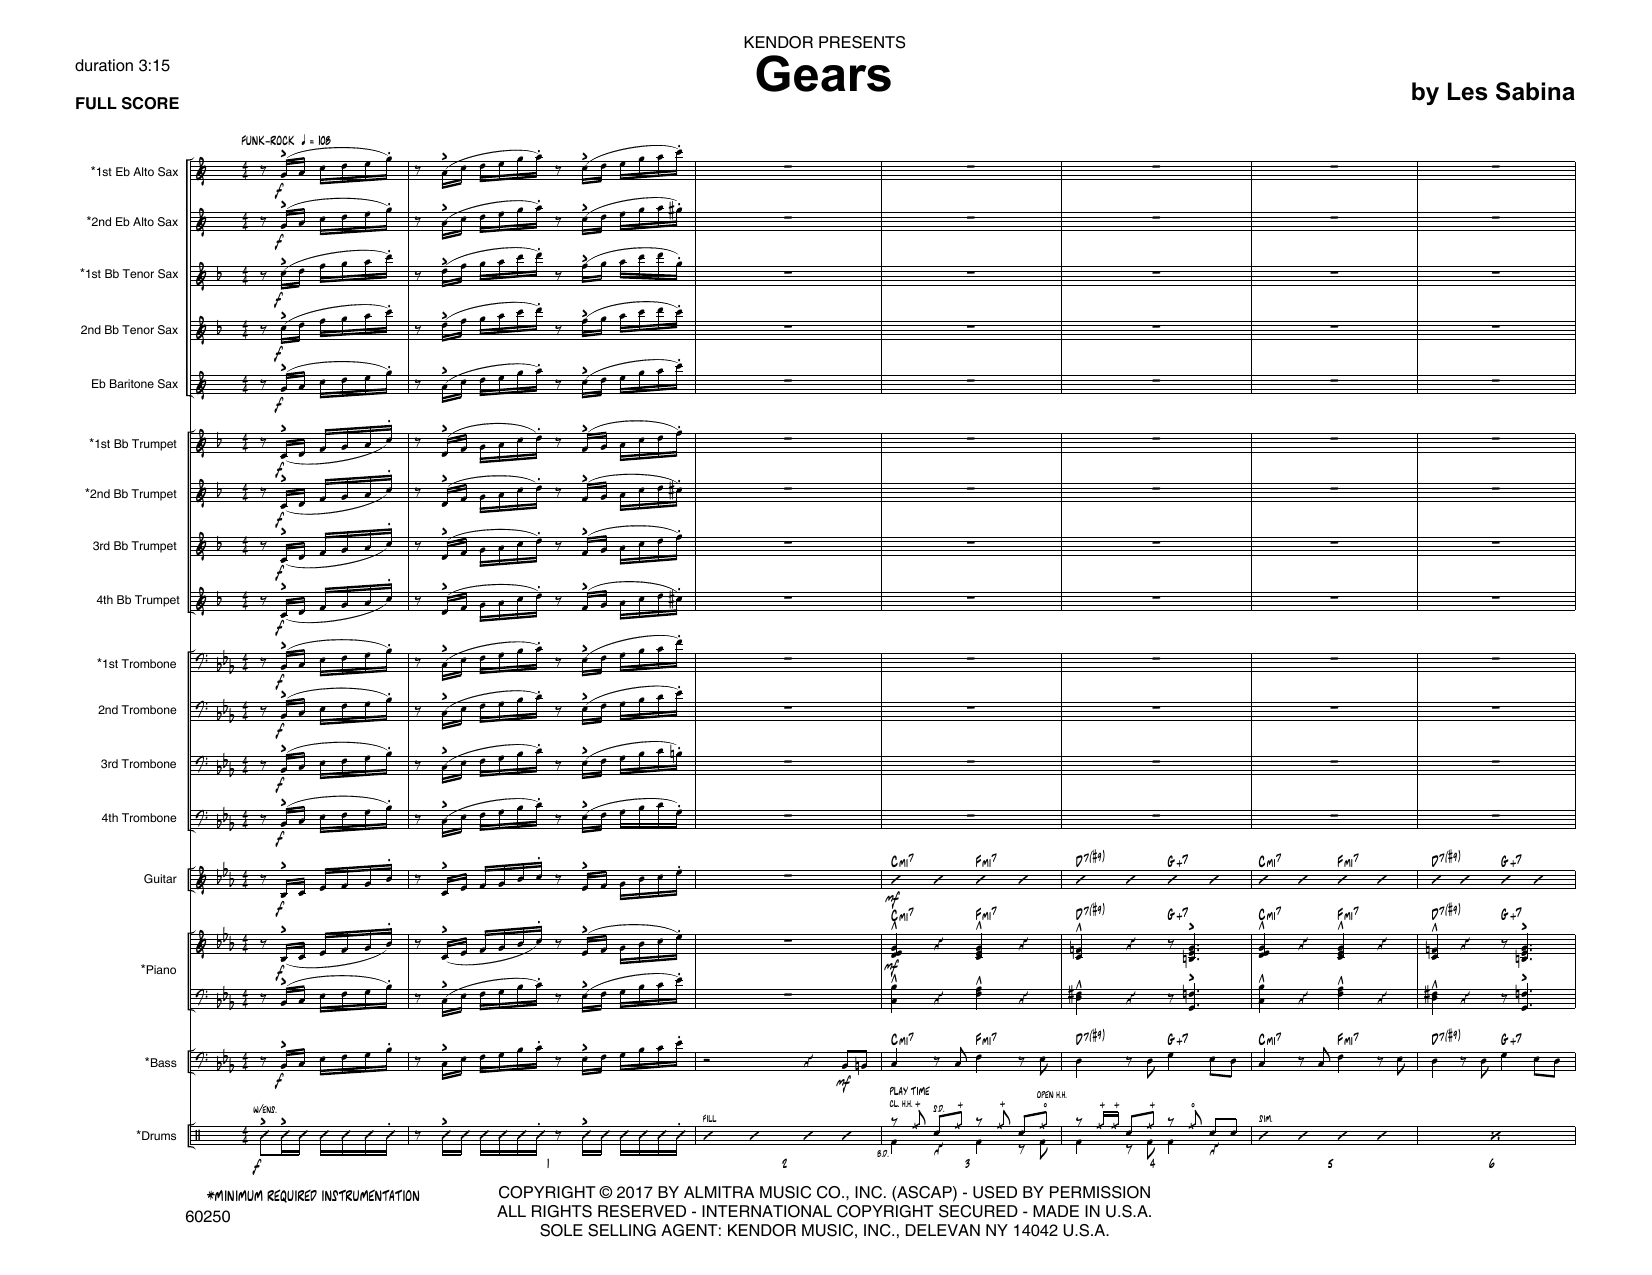 Les Sabina Gears - Full Score sheet music notes printable PDF score